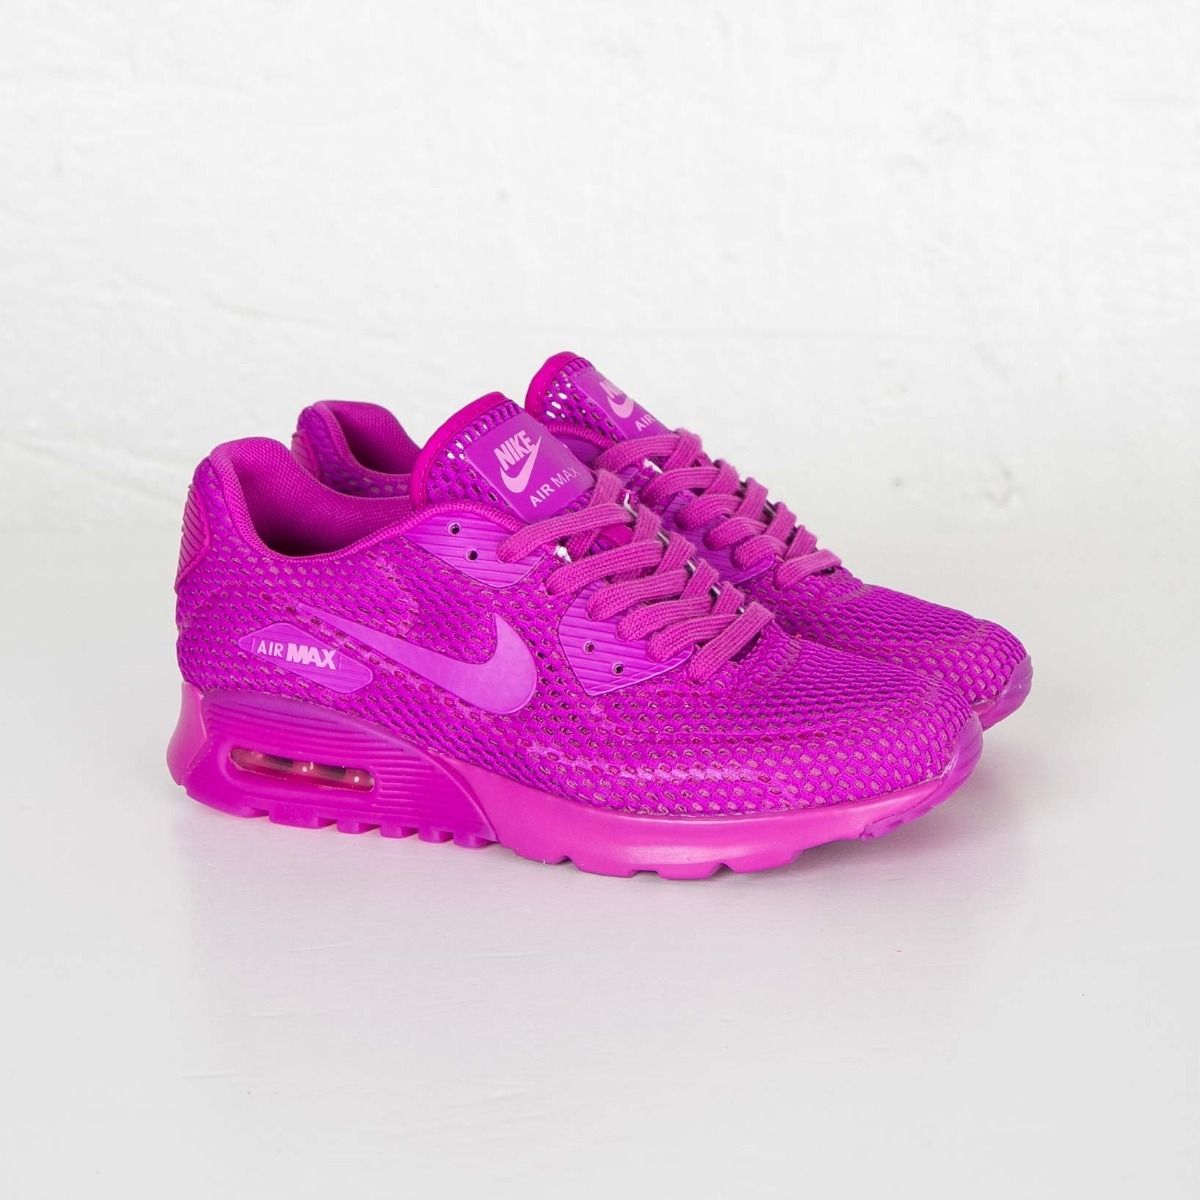 b1113263150b6 ... cheap zapatillas nike air max 90 ultra color violeta dama. cargando zoom.  abf78 7b9aa